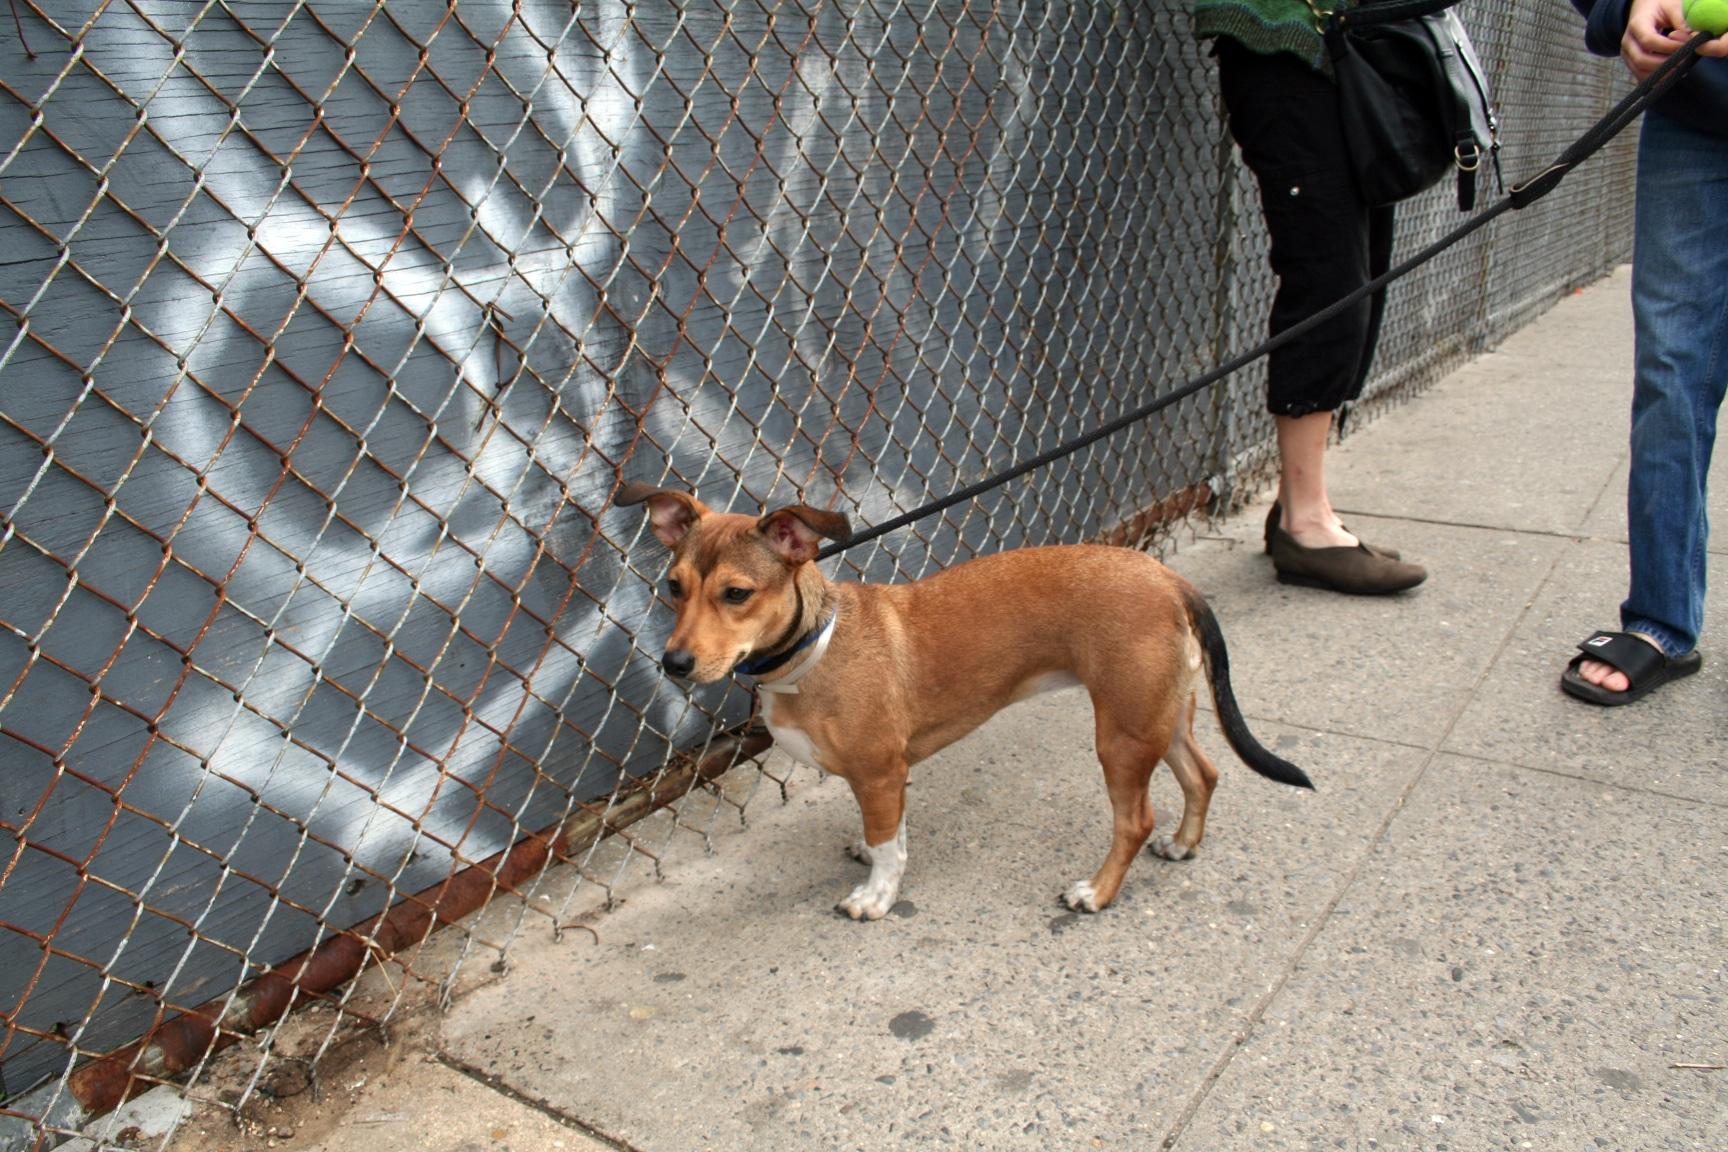 A small, mixed-breed dog on a leash walking along a sidewalk.